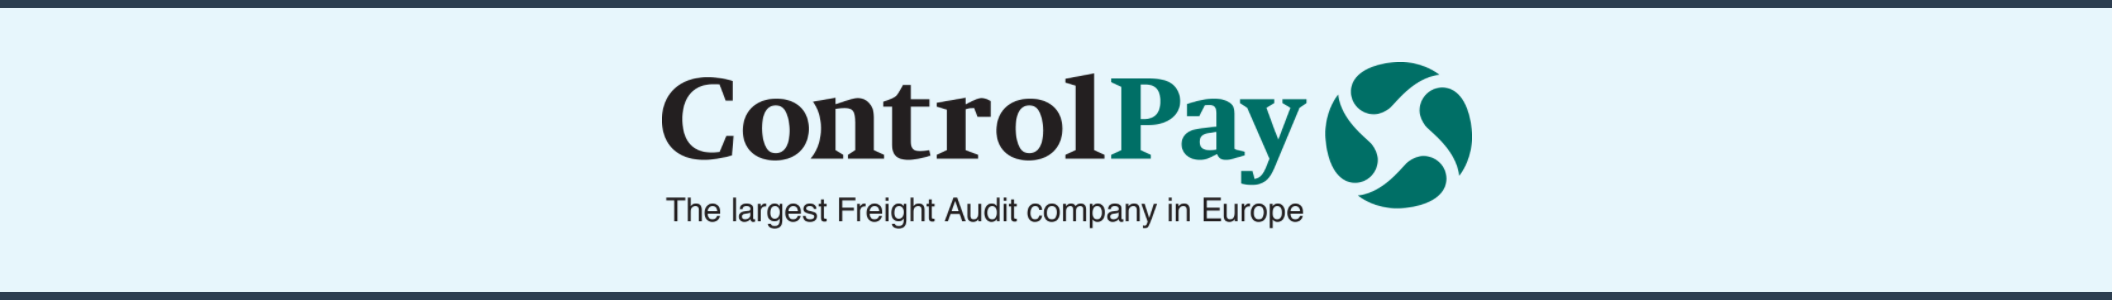 controlpay. freight audit